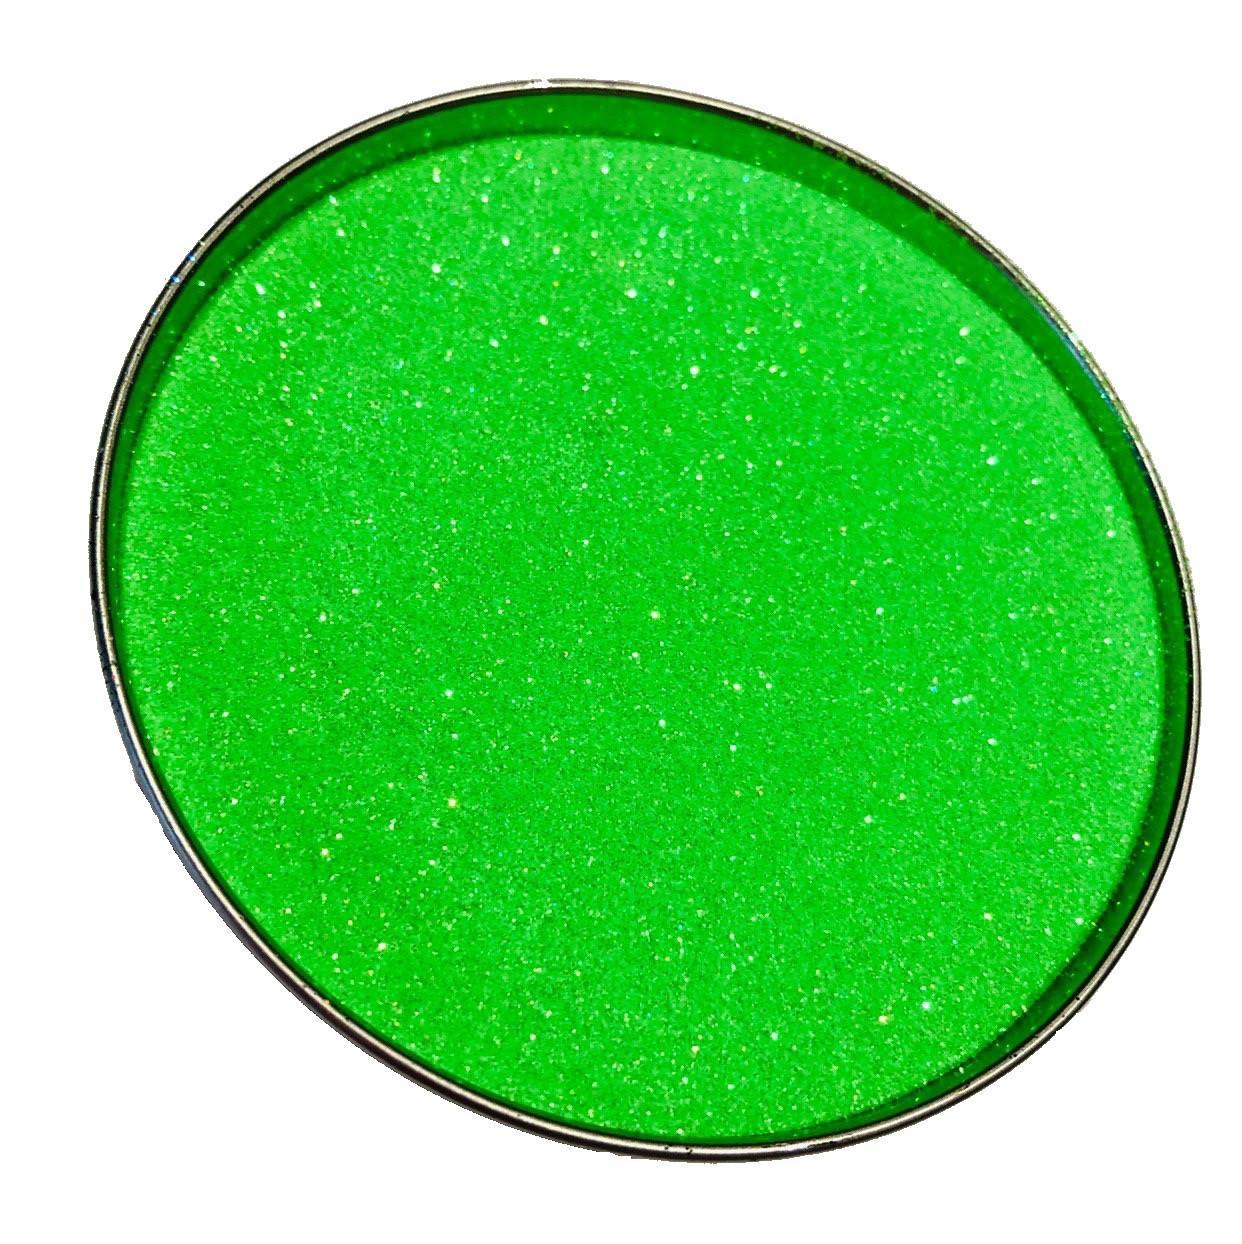 Глиттер радужный зеленый TRY506-128, 150мл